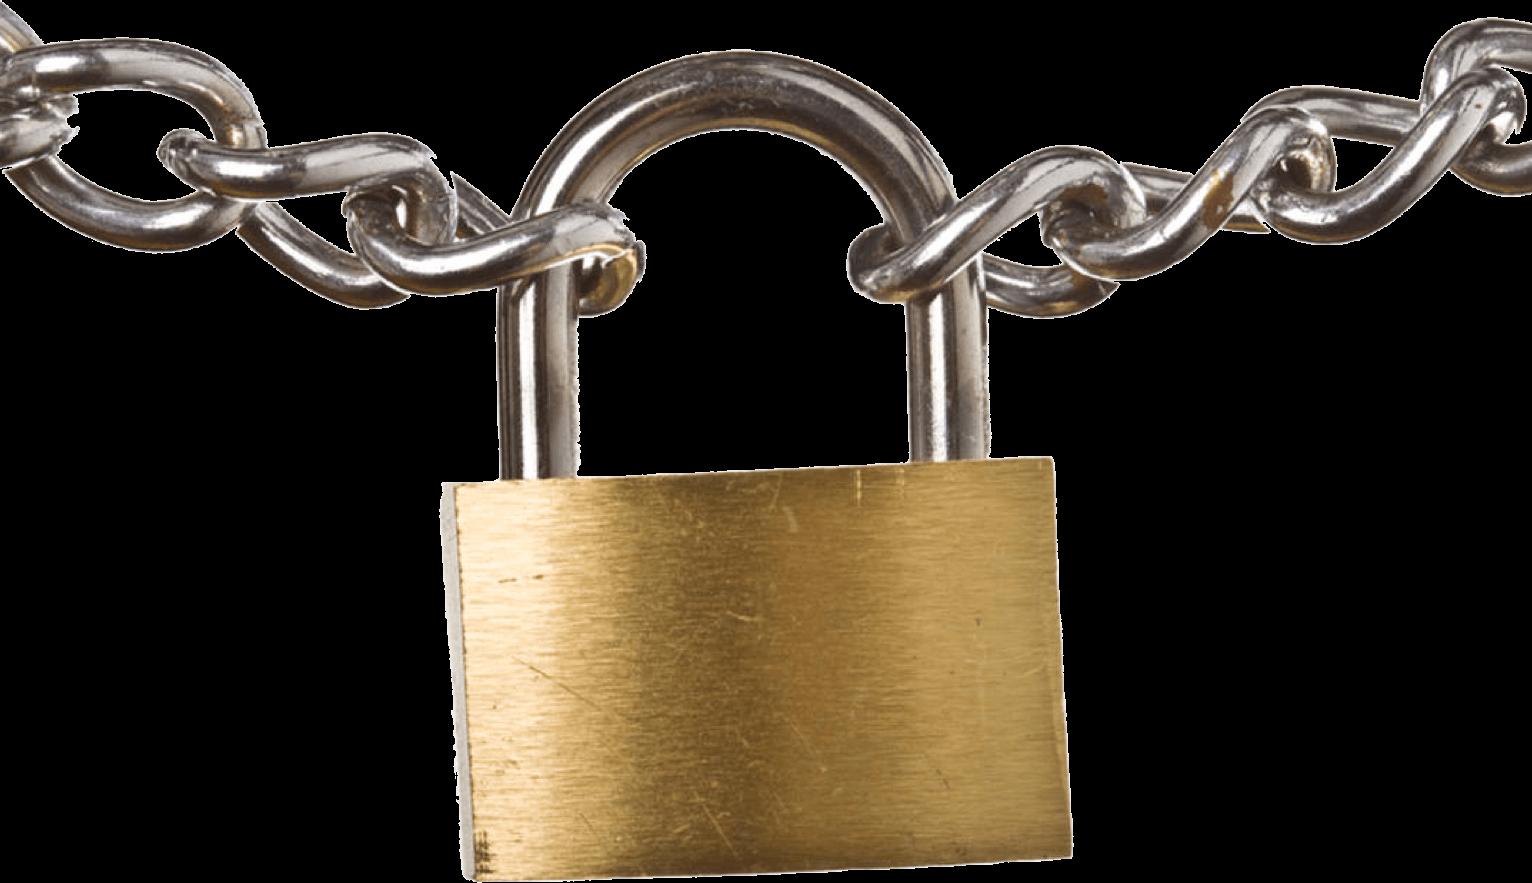 Padlock and keys transparent. Lock clipart lock chain